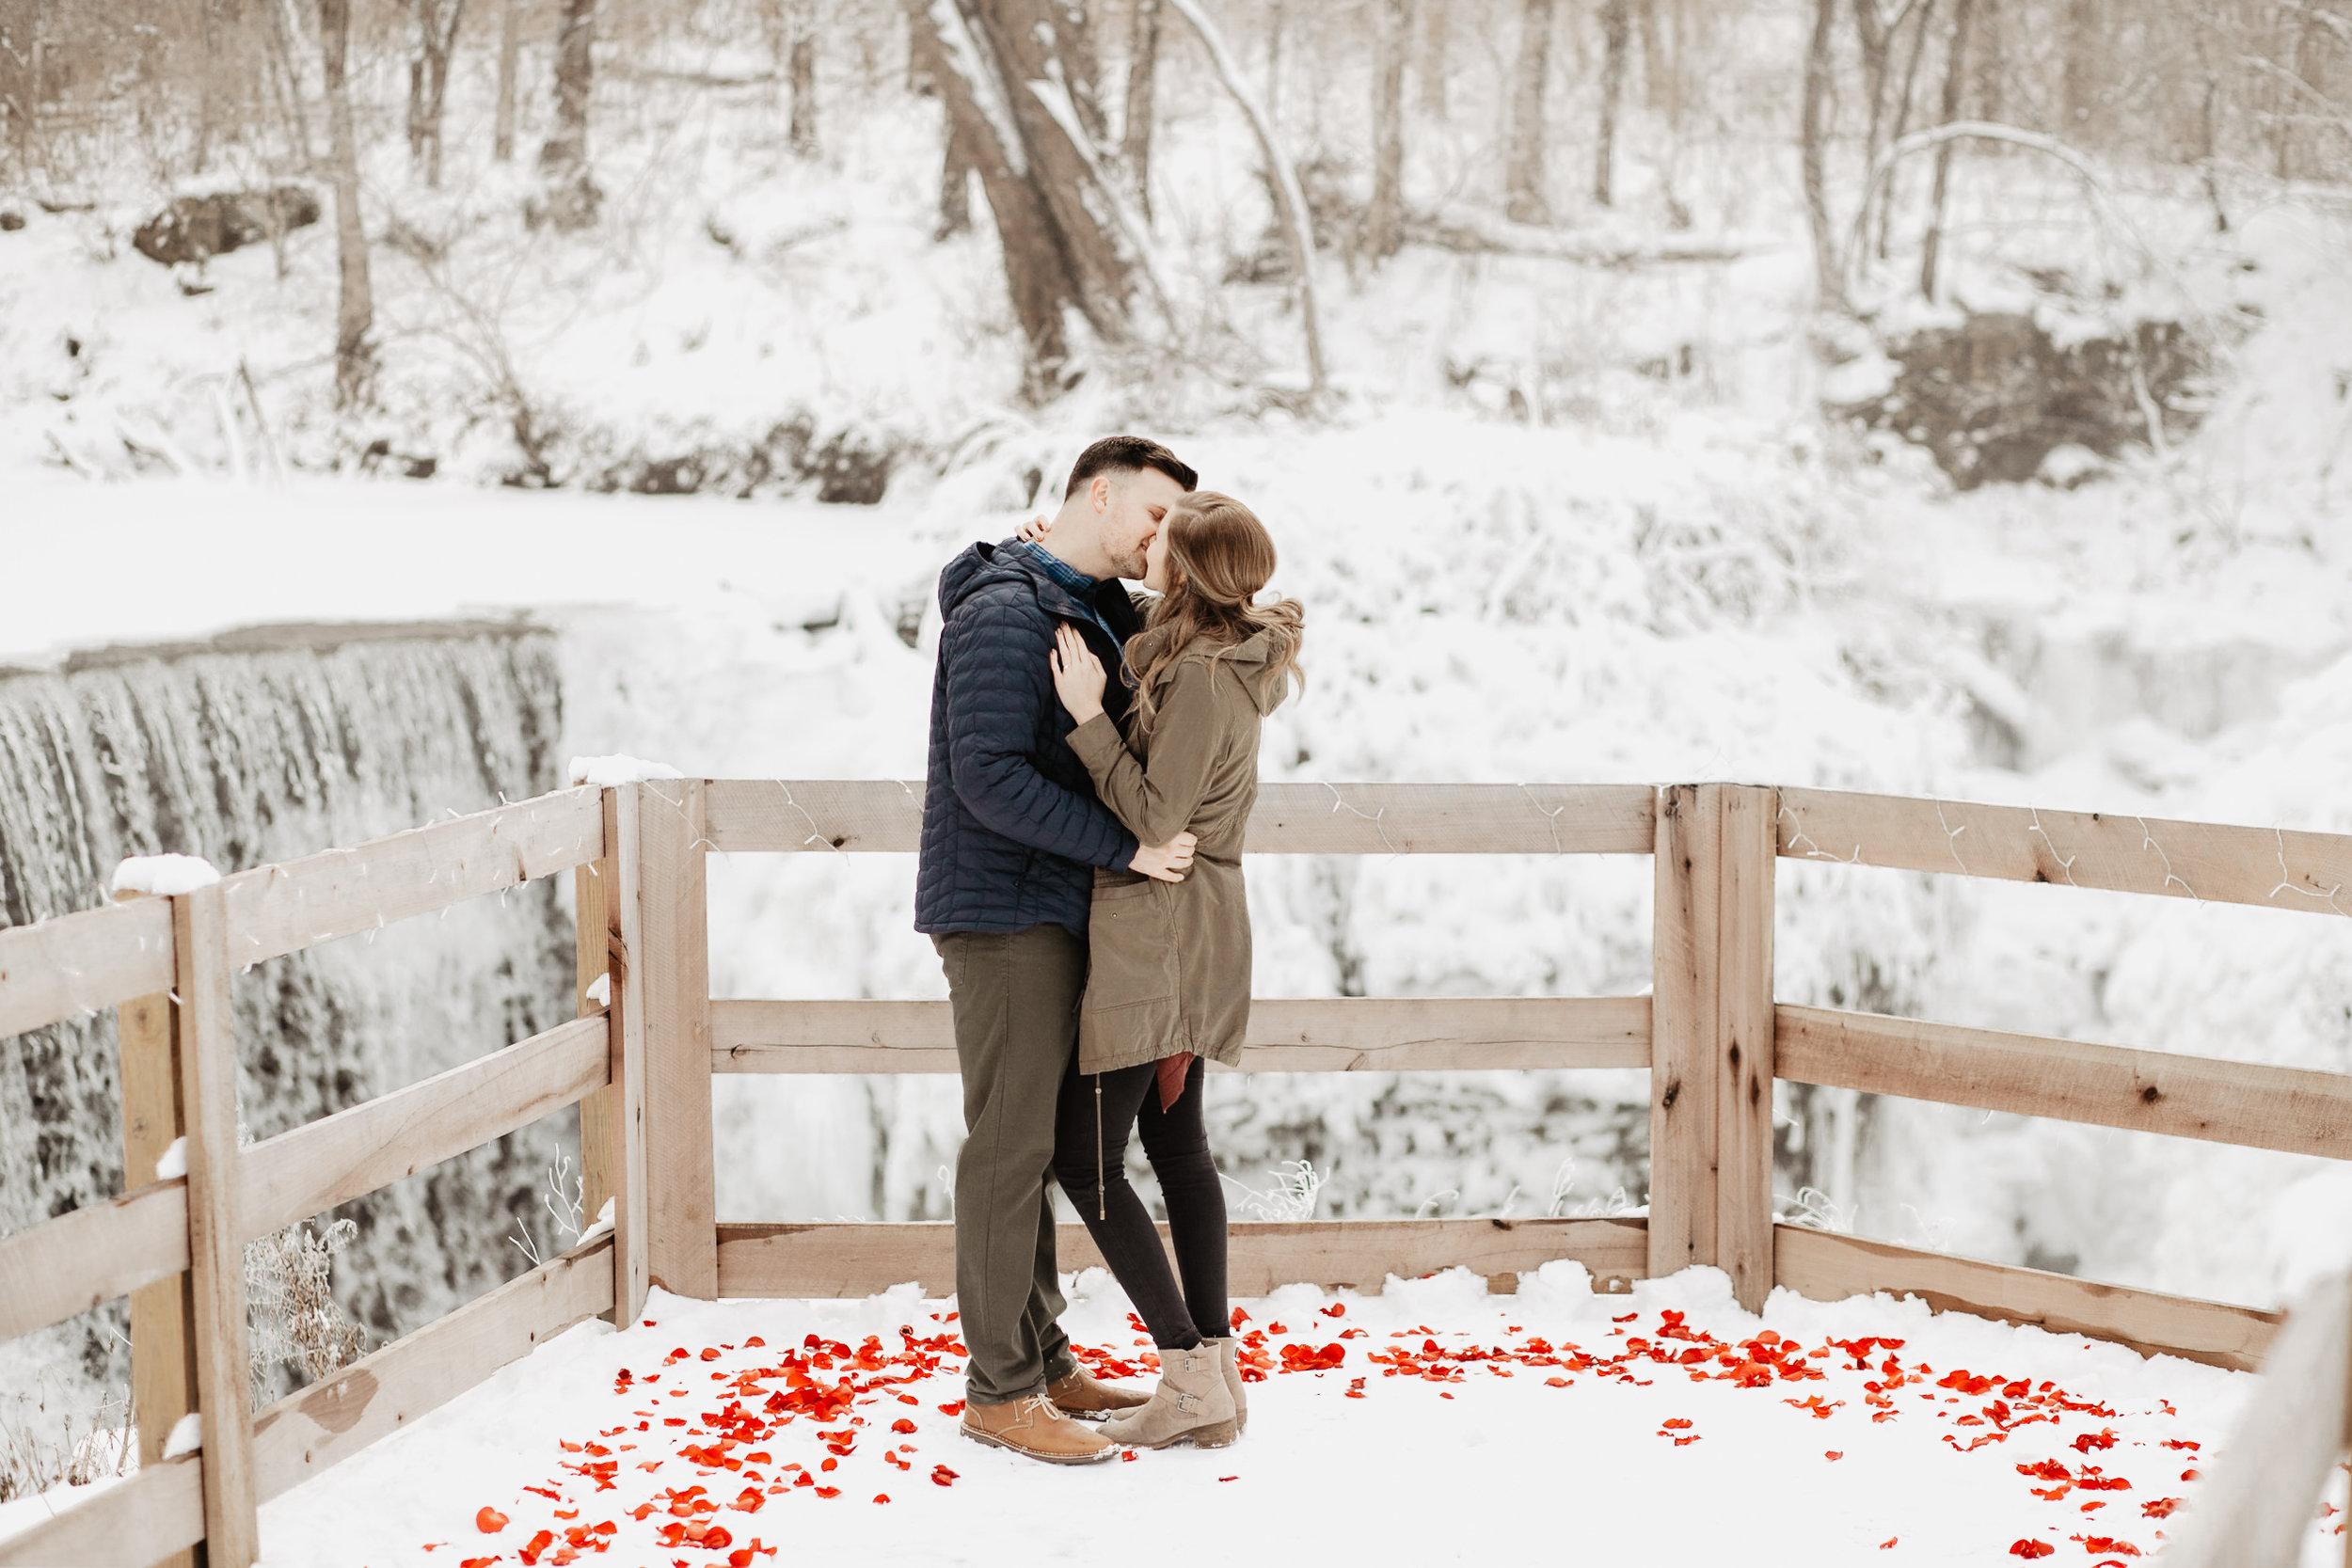 Anna + Stephen   Ohio Waterfall Winter Surprise Proposal   Columbus Wedding + Engagement Photographer   Catherine Milliron Photography